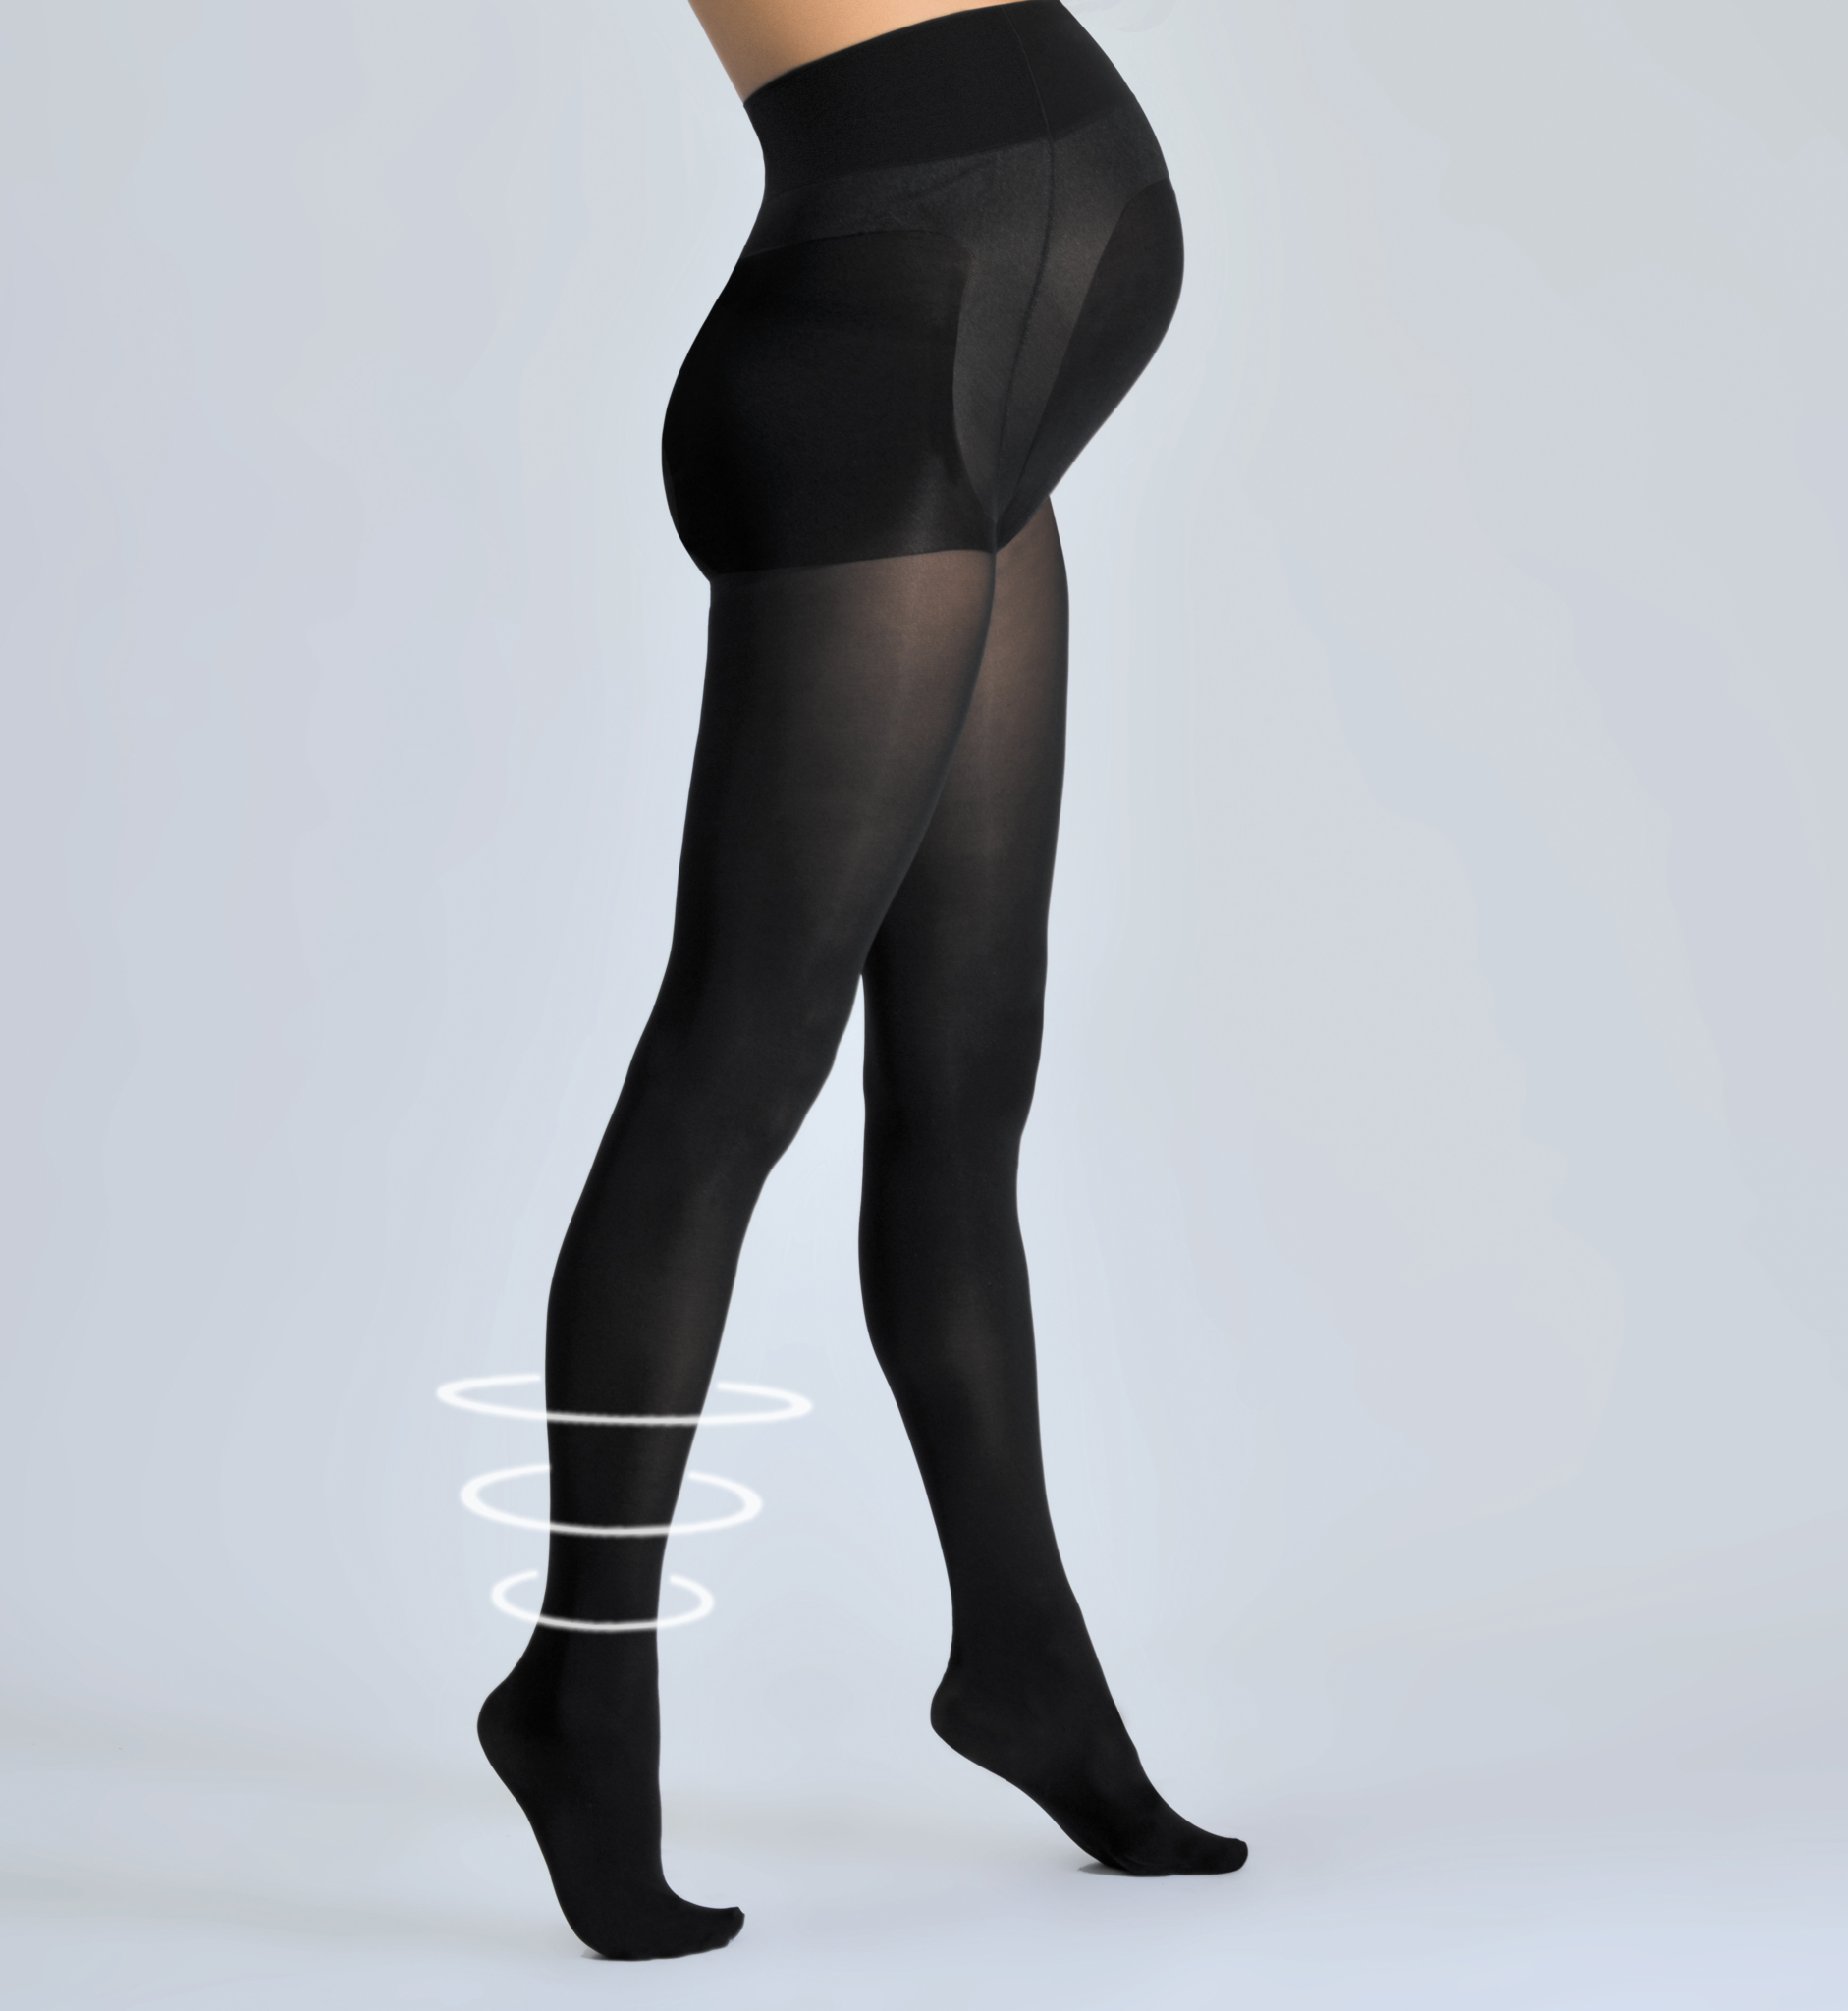 Zwangerschaps panty Activ zwart Cache Coeur